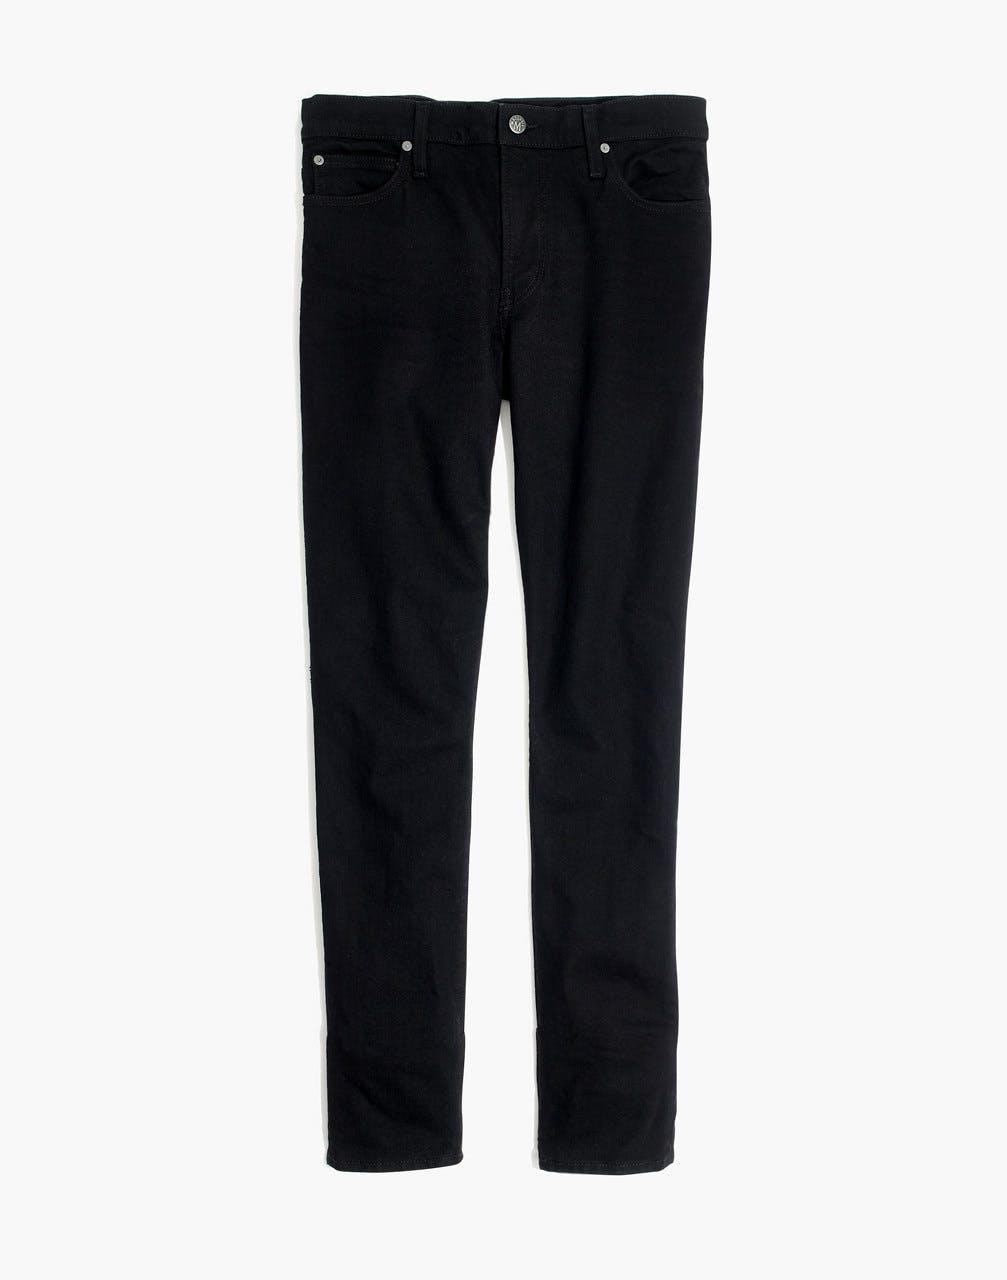 madewell, madewell jeans, madewell denim, jeans, denim, skinny jeans, denimblog, denim blog, jeansblog, jeans blog, skinny jeans, slim jeans, skinny denim, slim denim, black jeans, black denim, saturated black denim. saturated black jeans